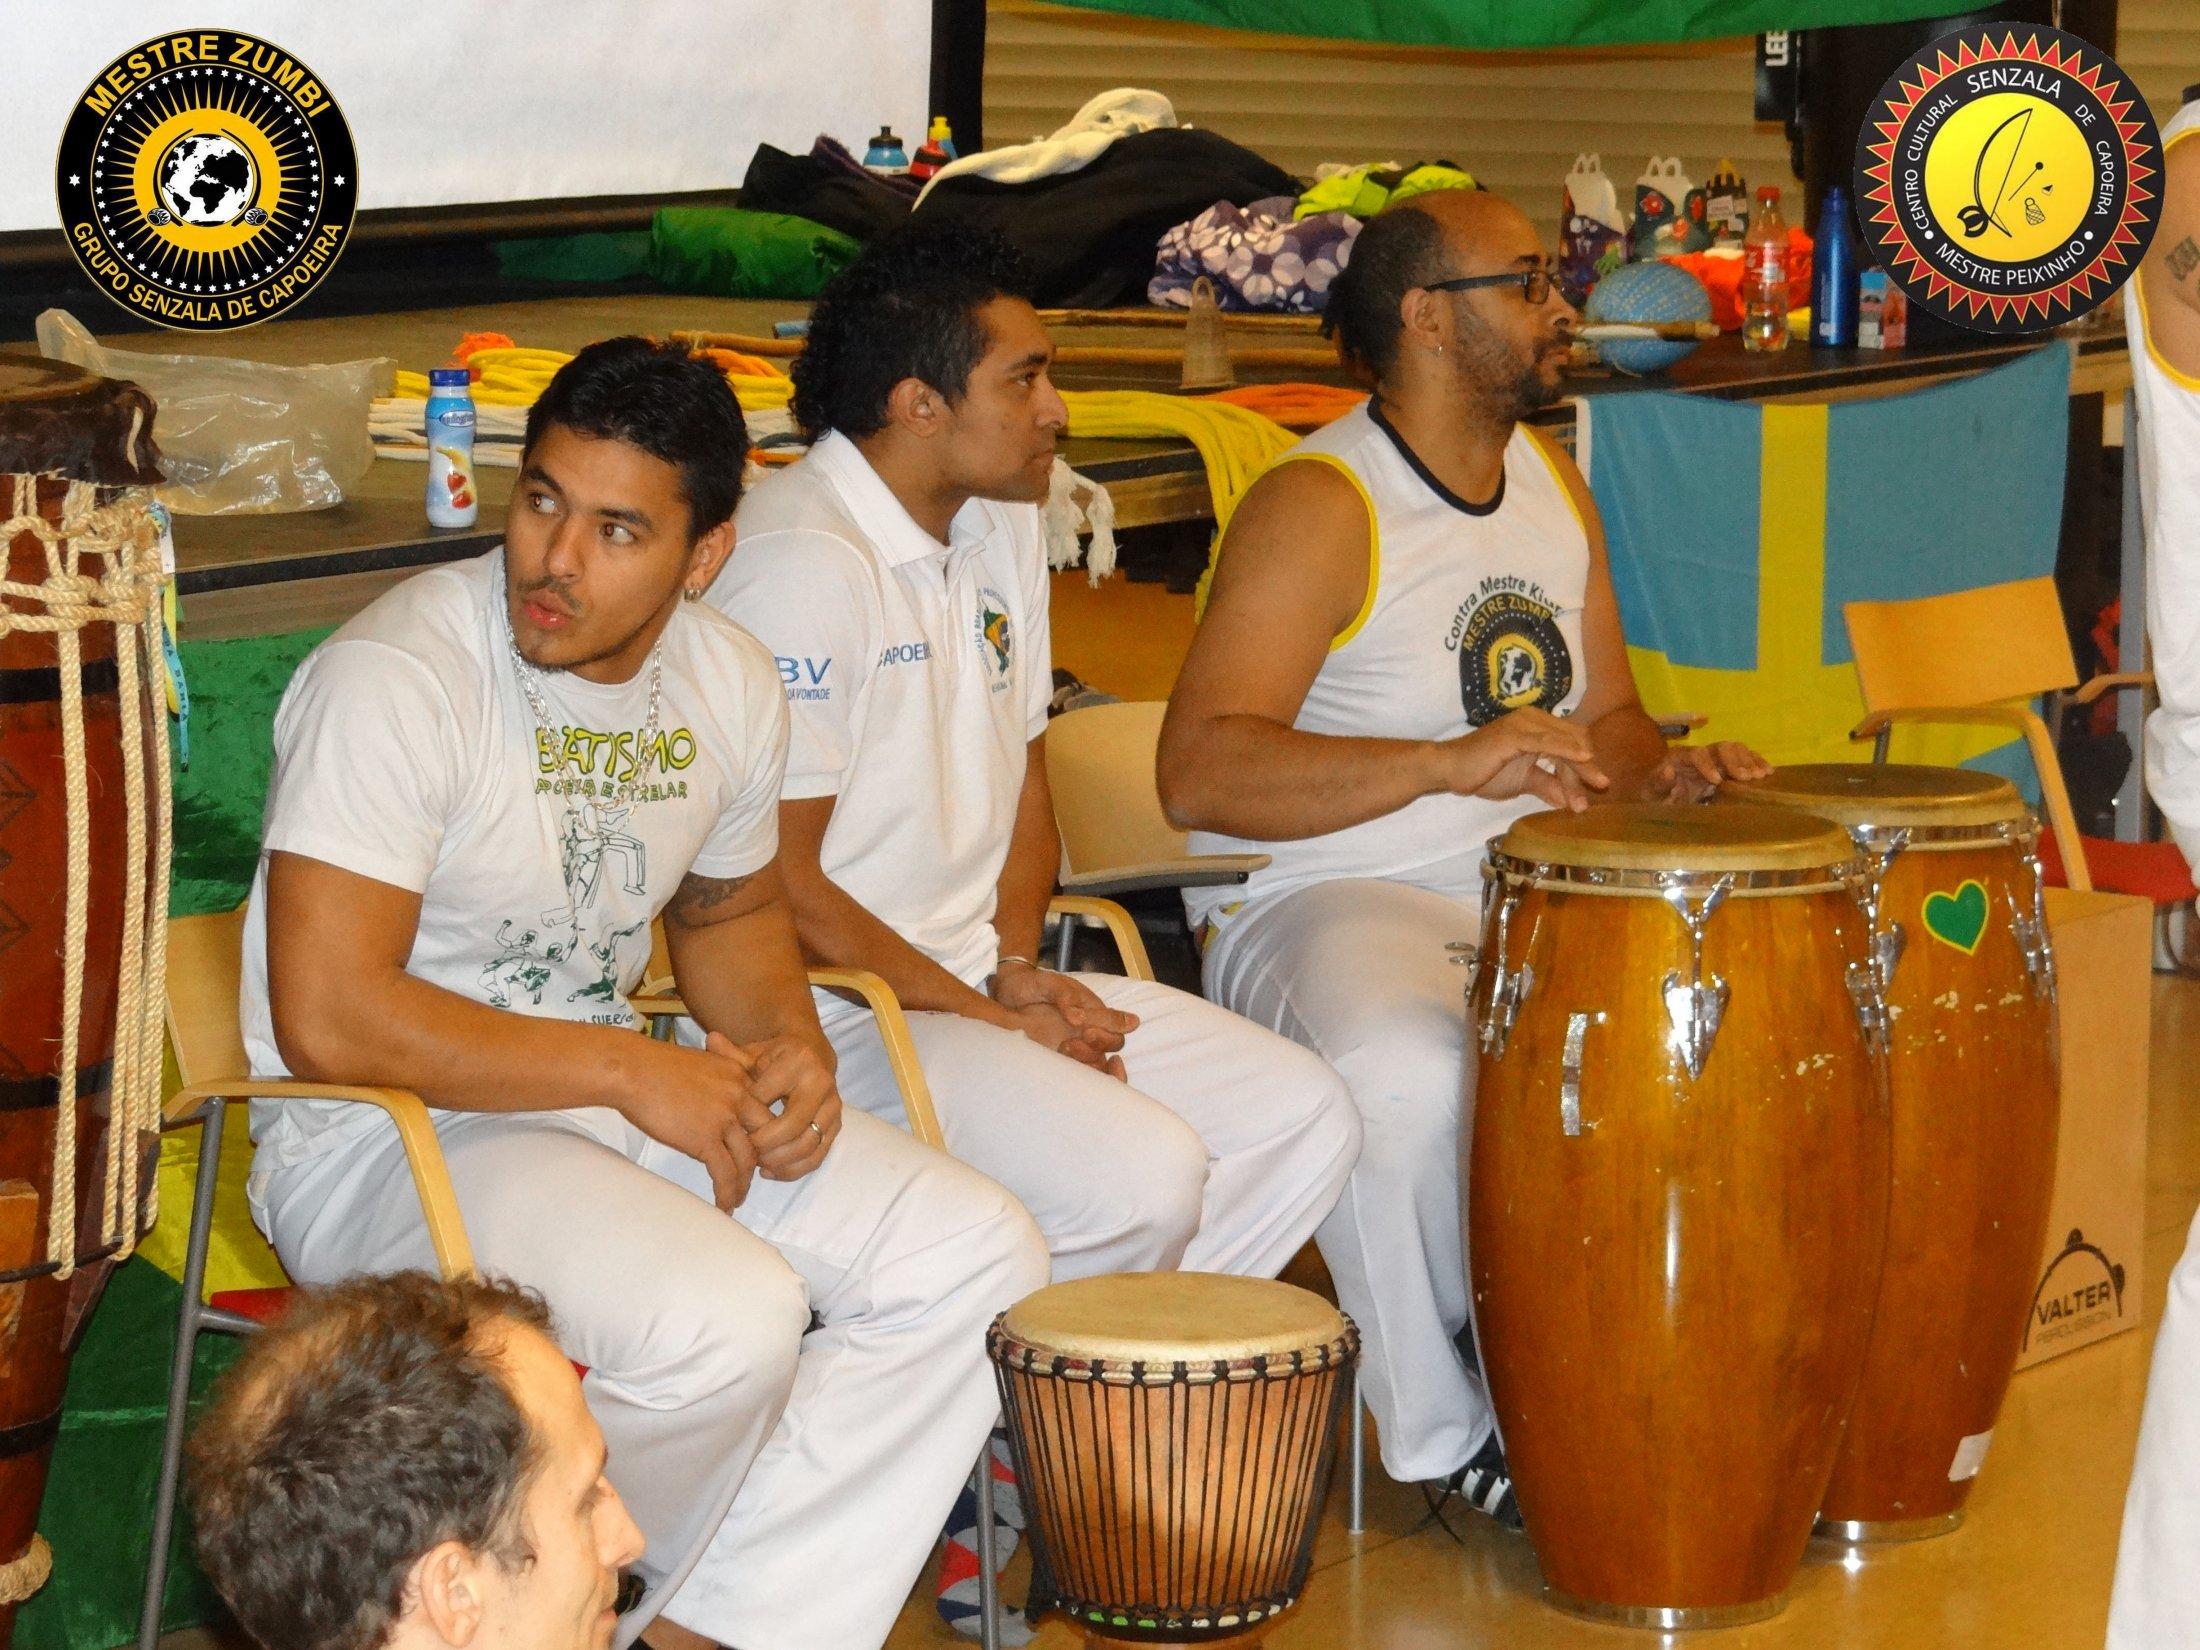 2013-12-14 - Capoeira 015